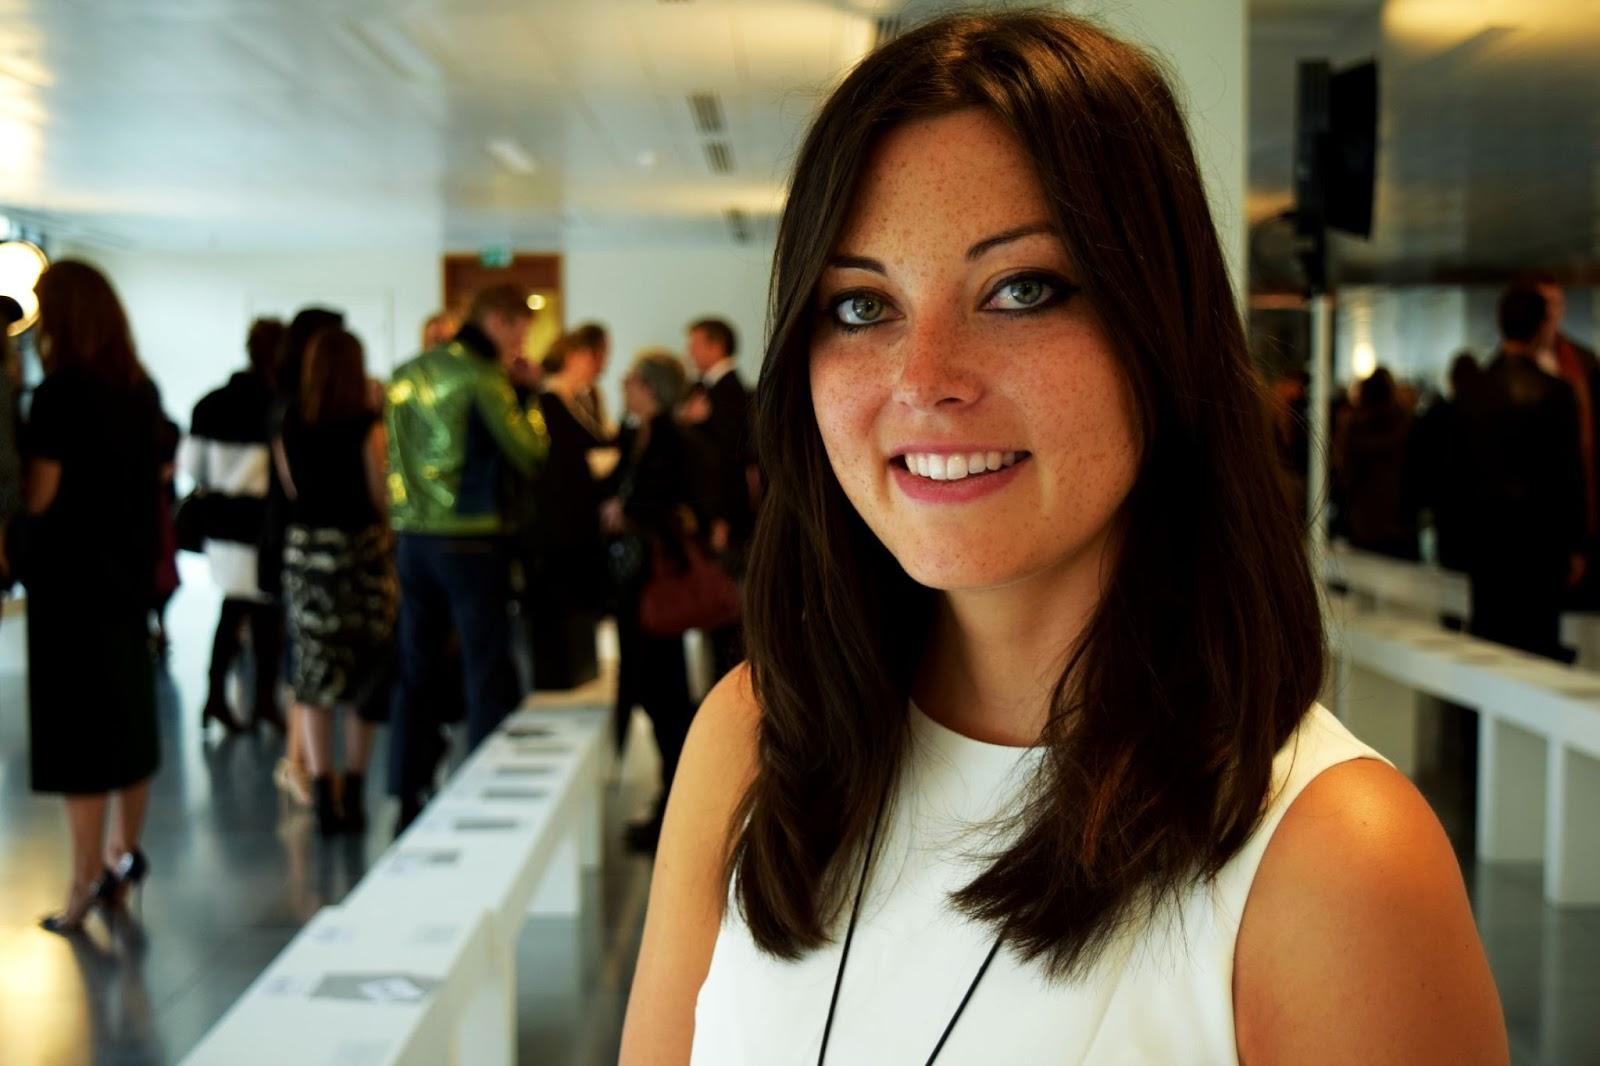 Fashion Blogger at London Fashion Week